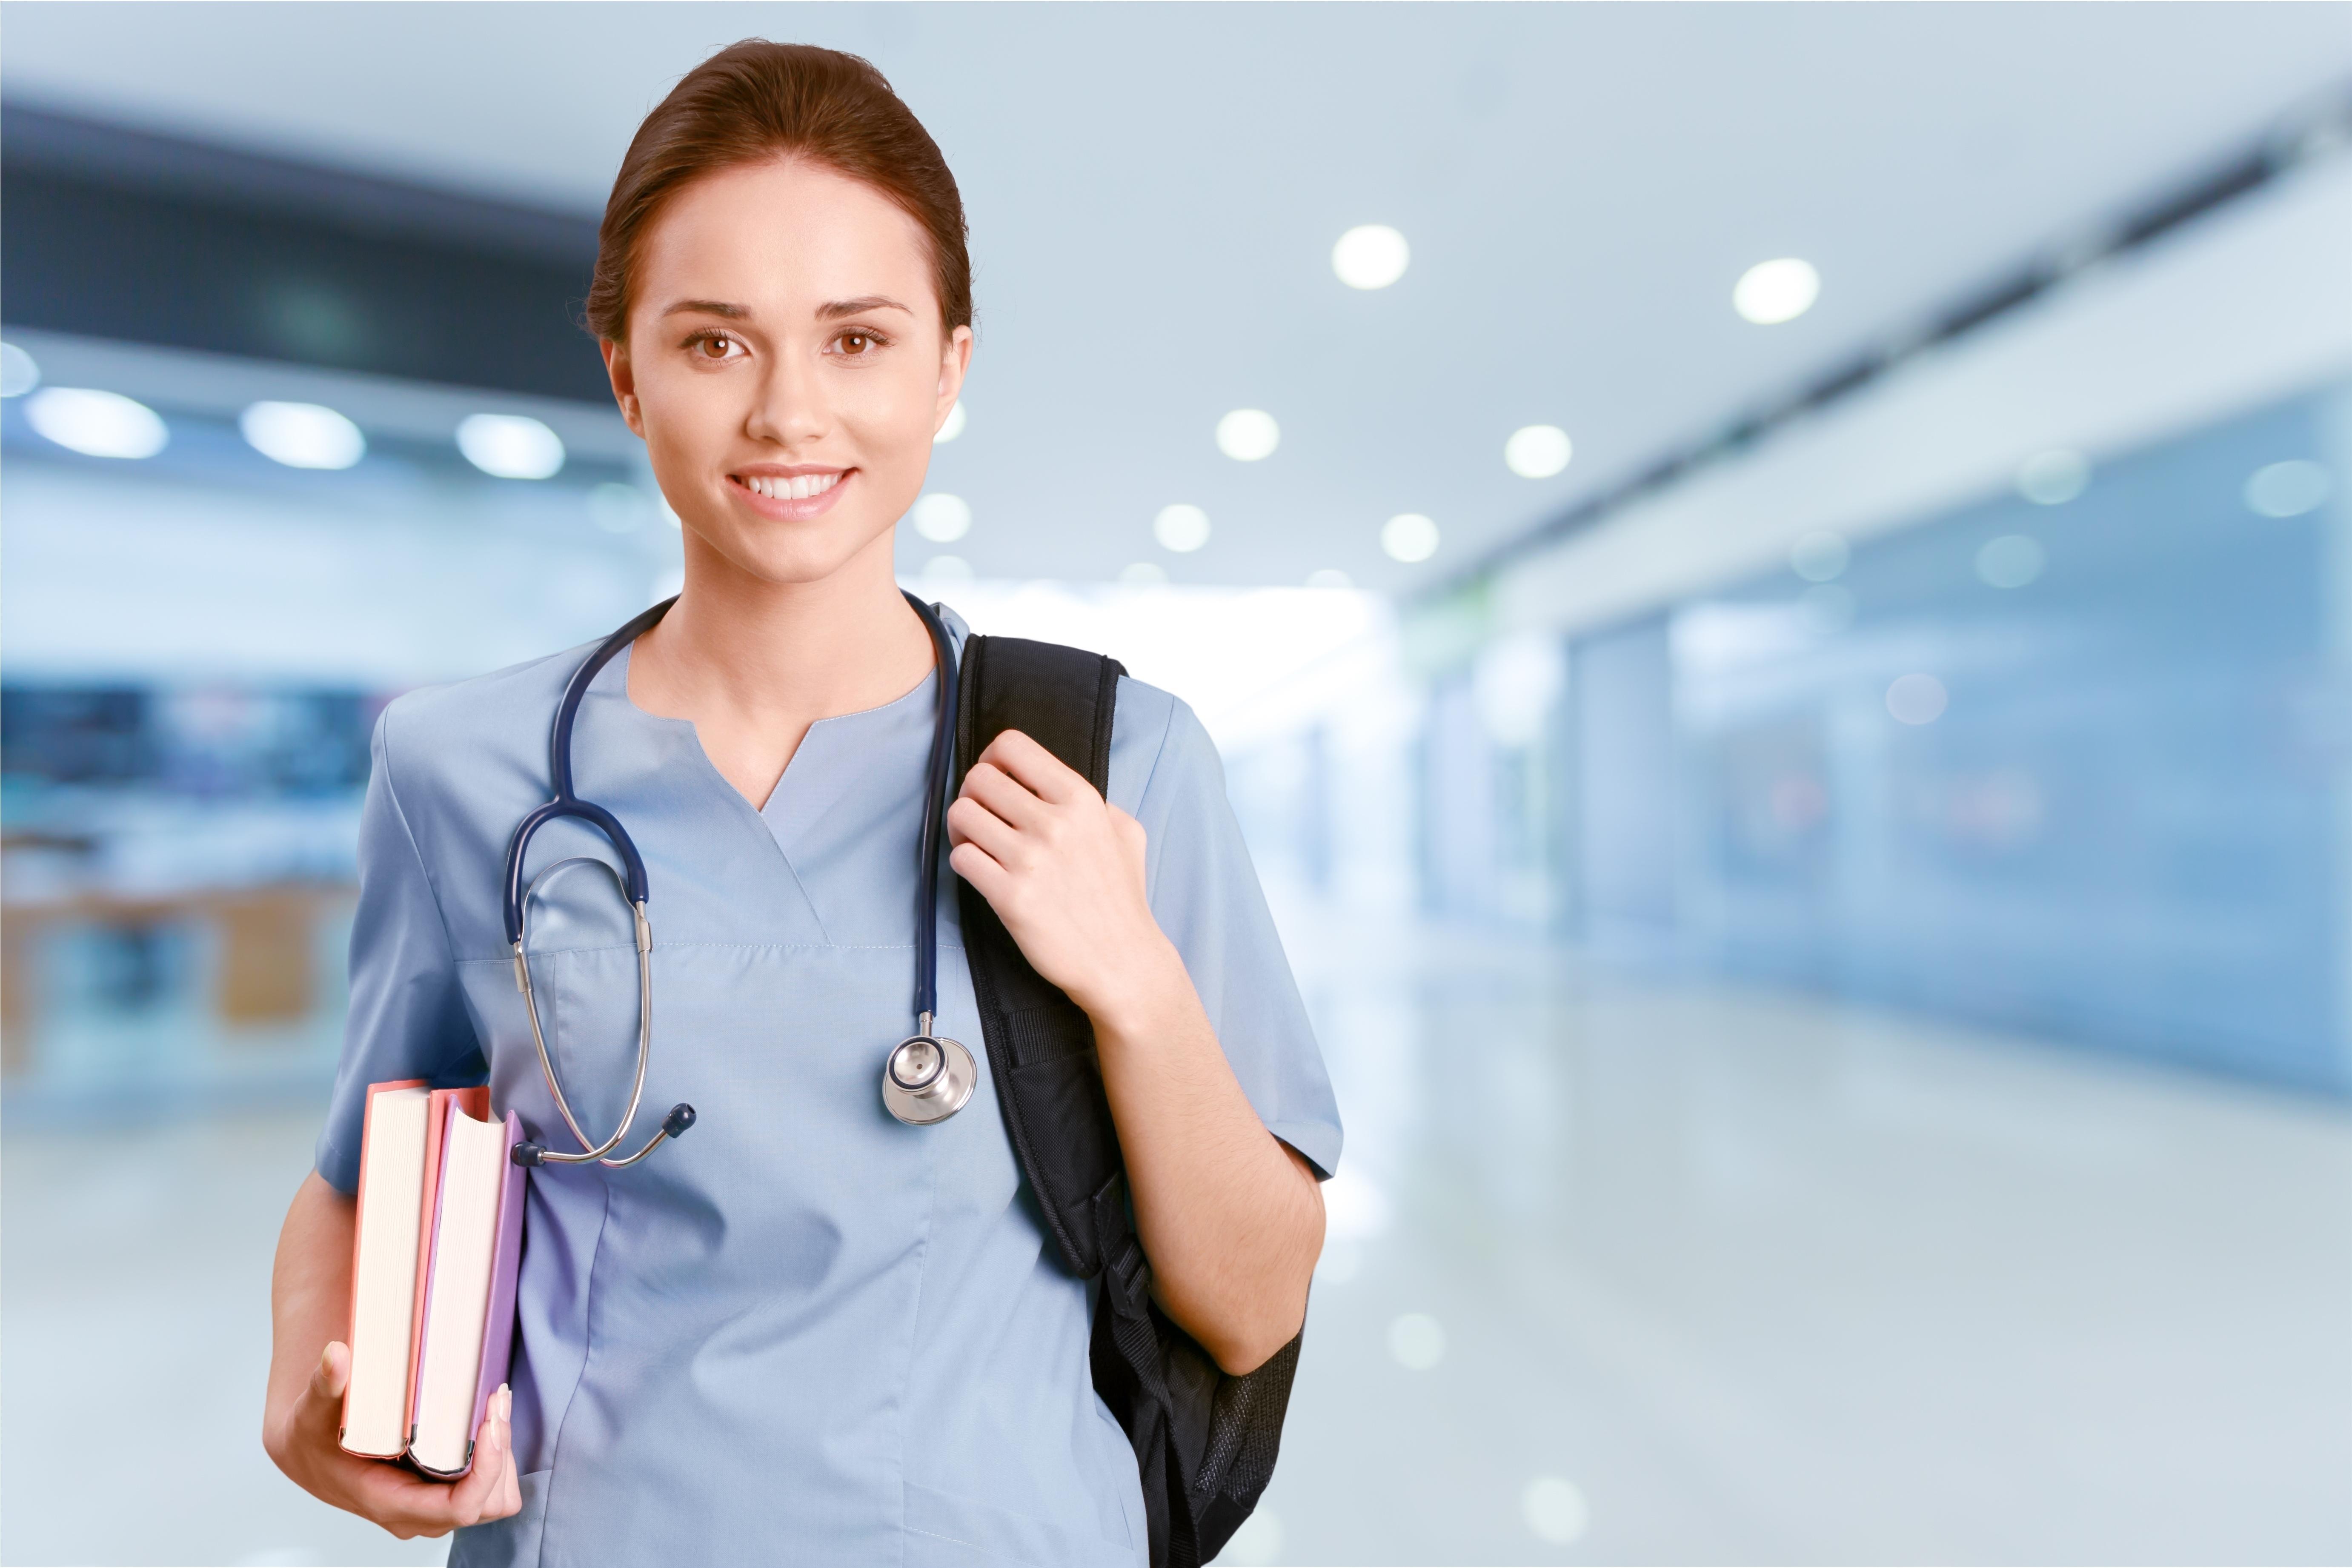 Medical student - Copy